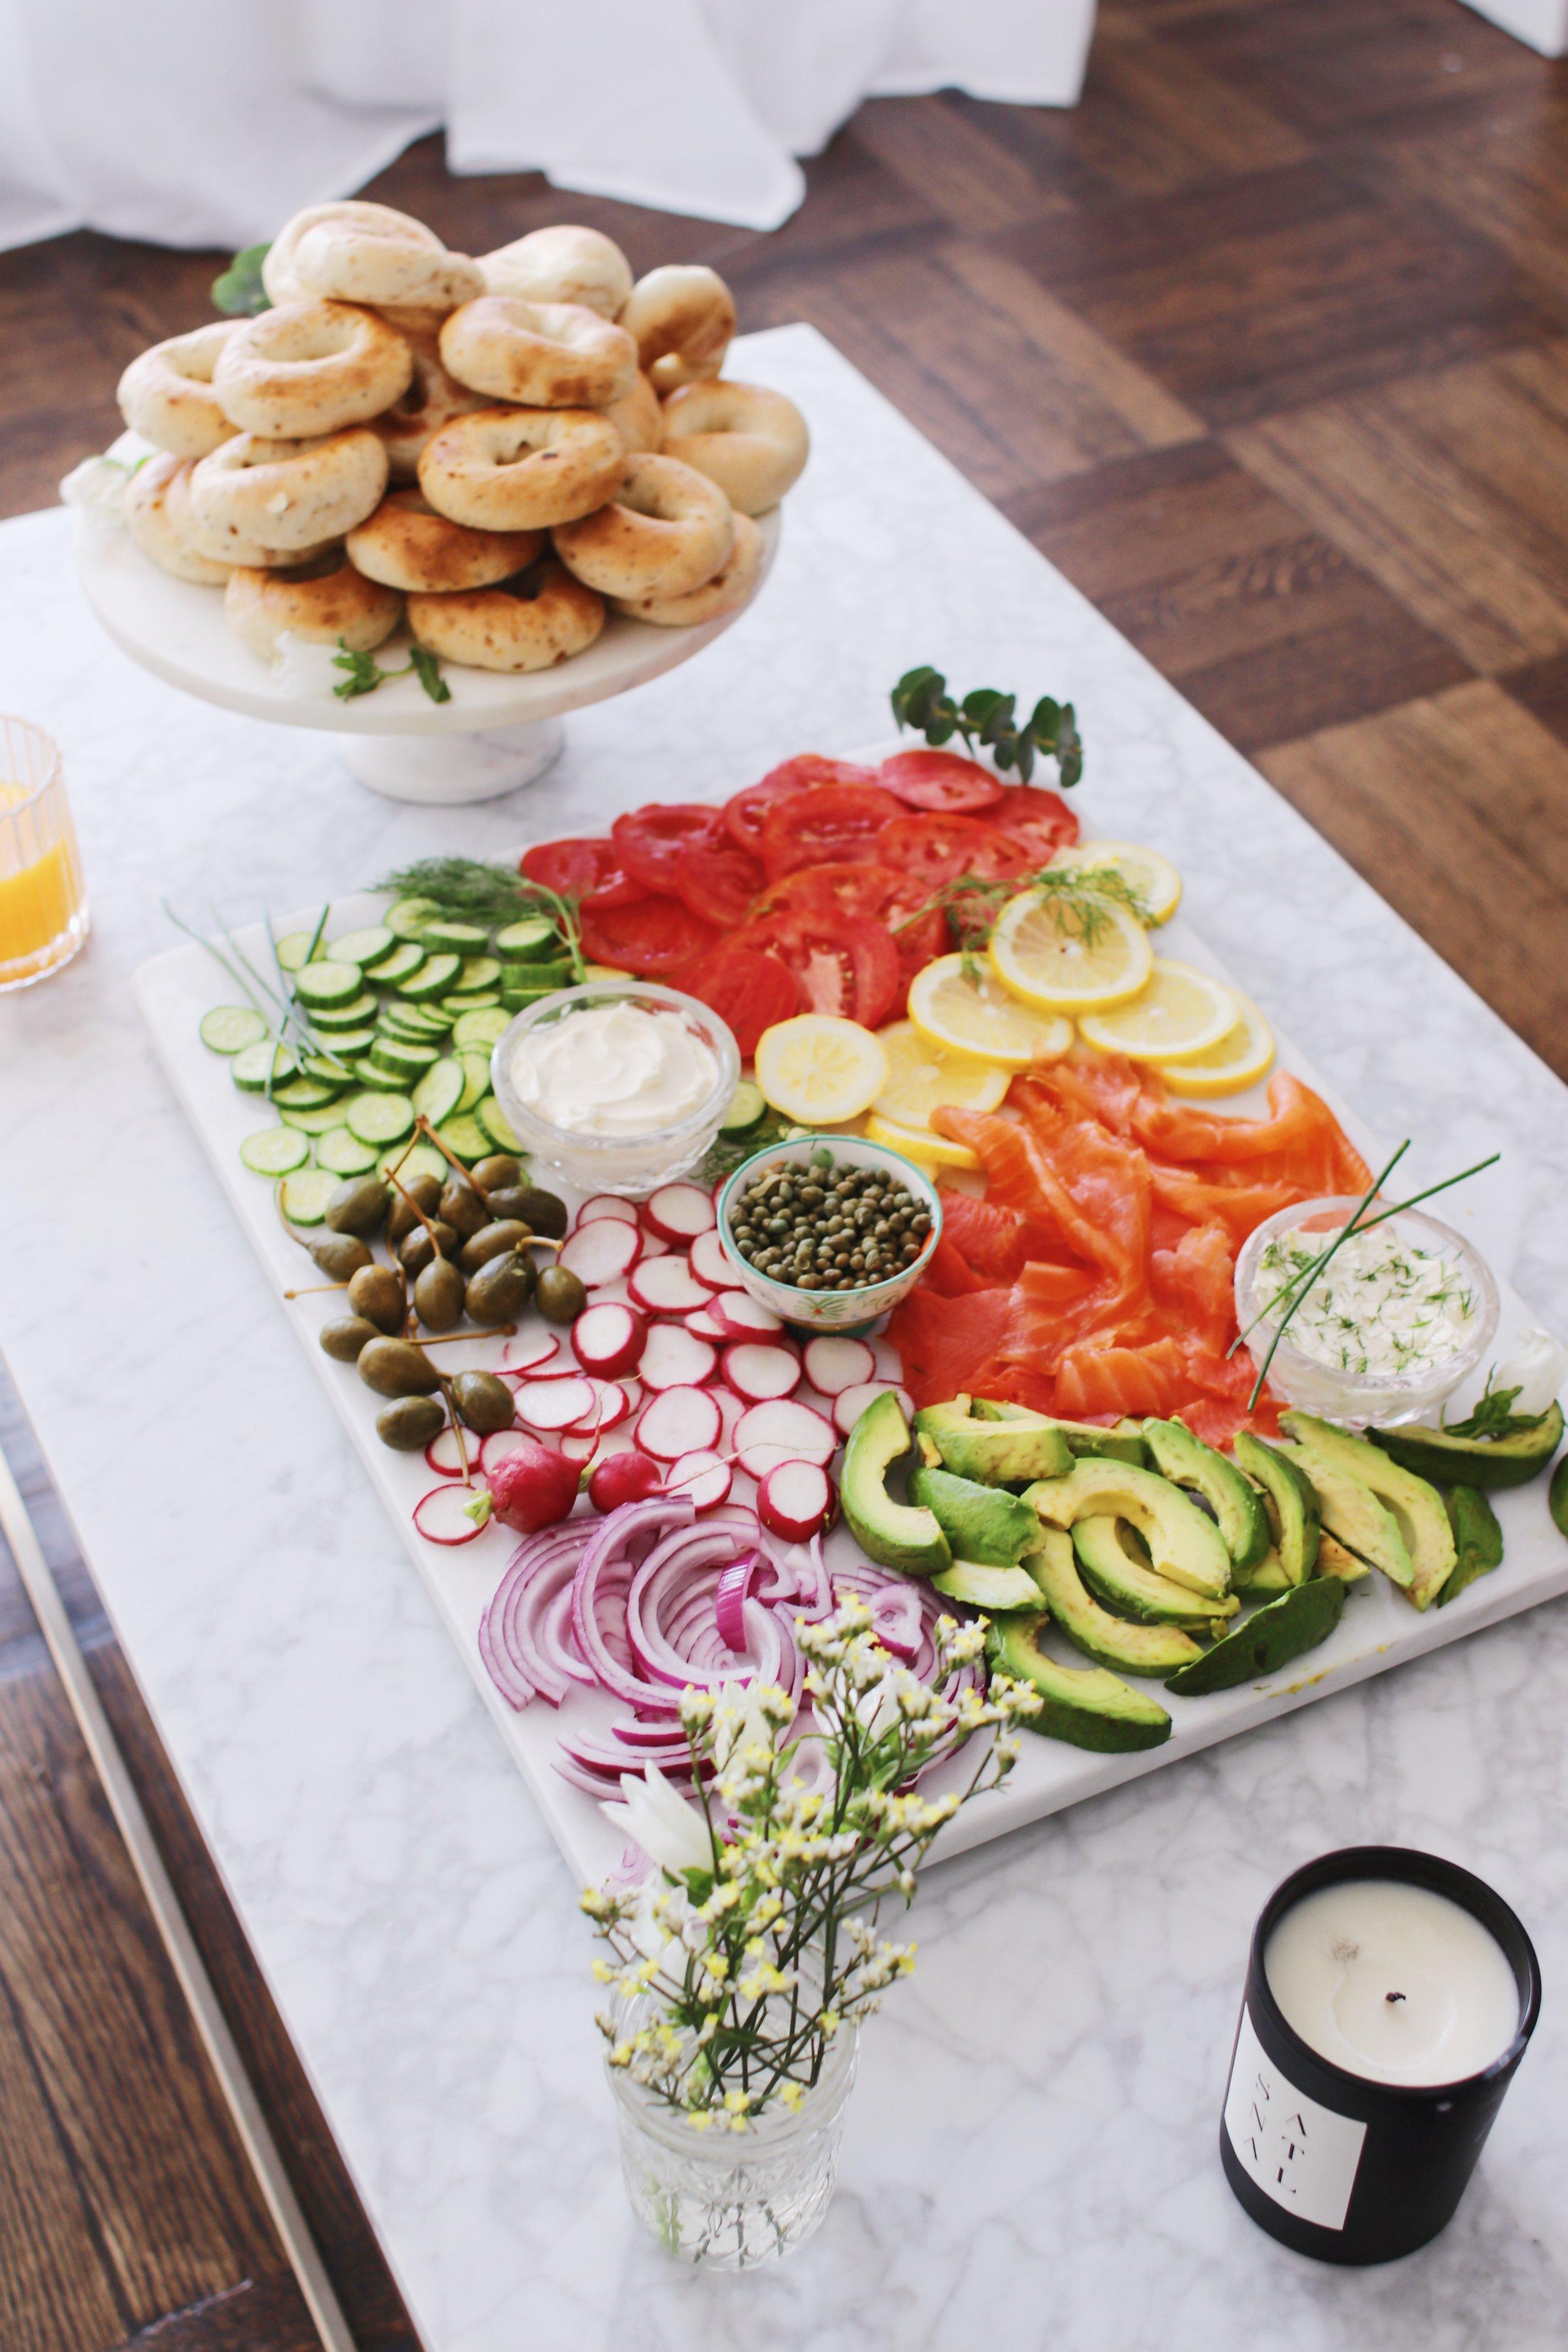 bagel-board-yom-kippur-break-fast-recipes-ideas1323.JPG